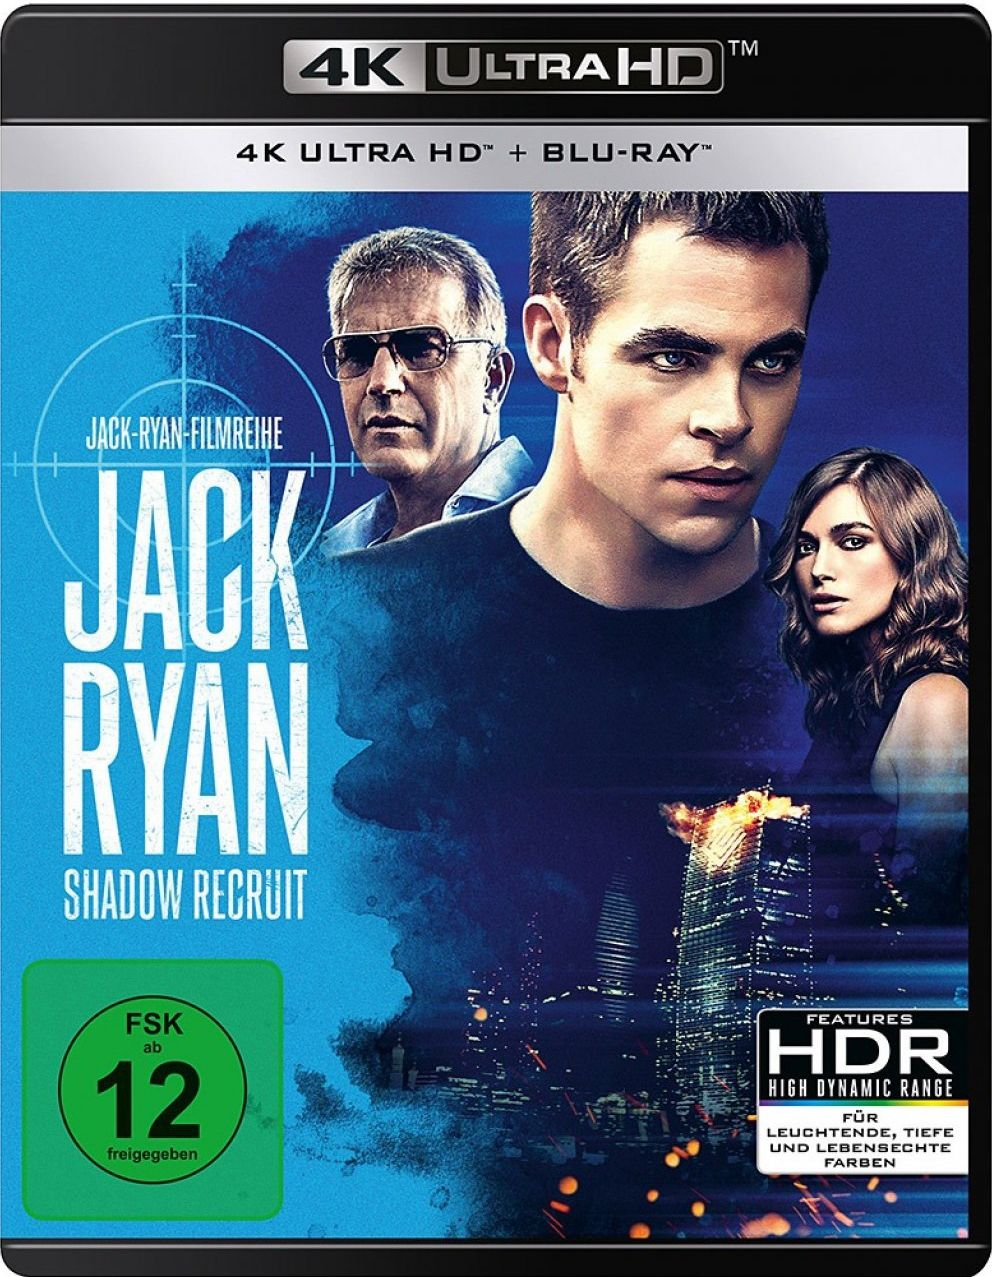 Jack Ryan: Shadow Recruit (2 Discs) (UHD BLURAY + BLURAY)